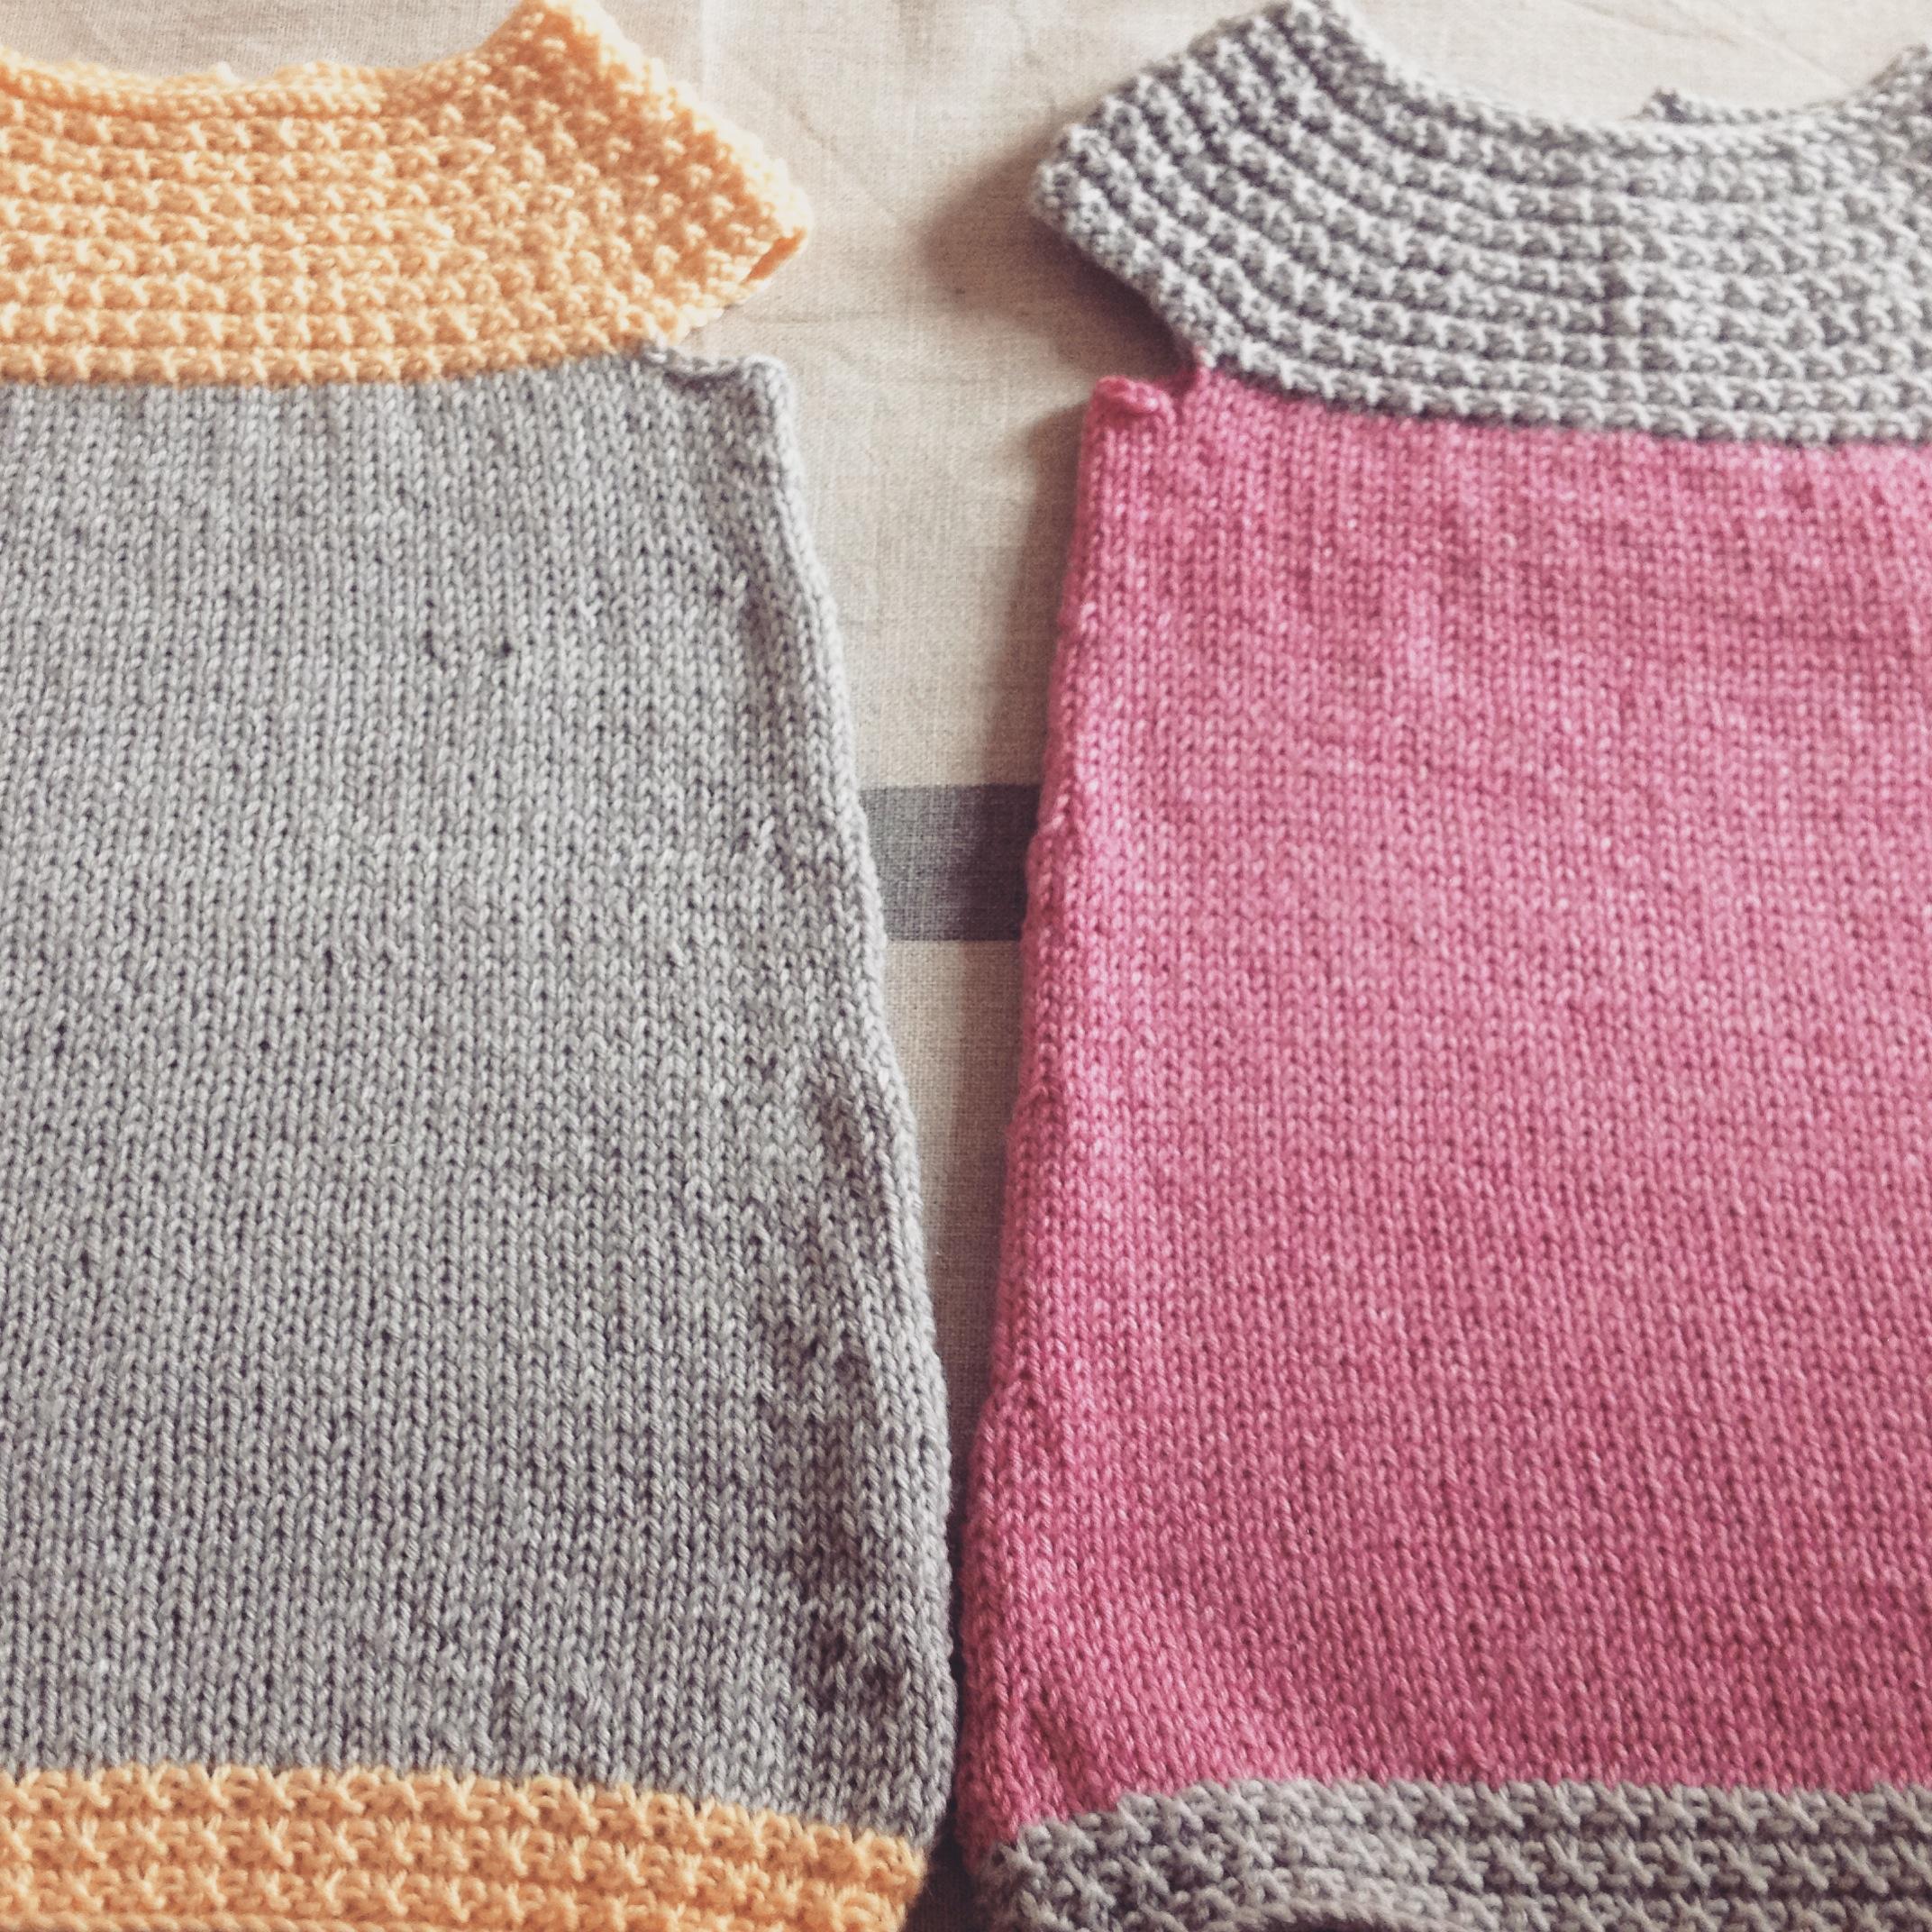 knitting – Nicola Loves